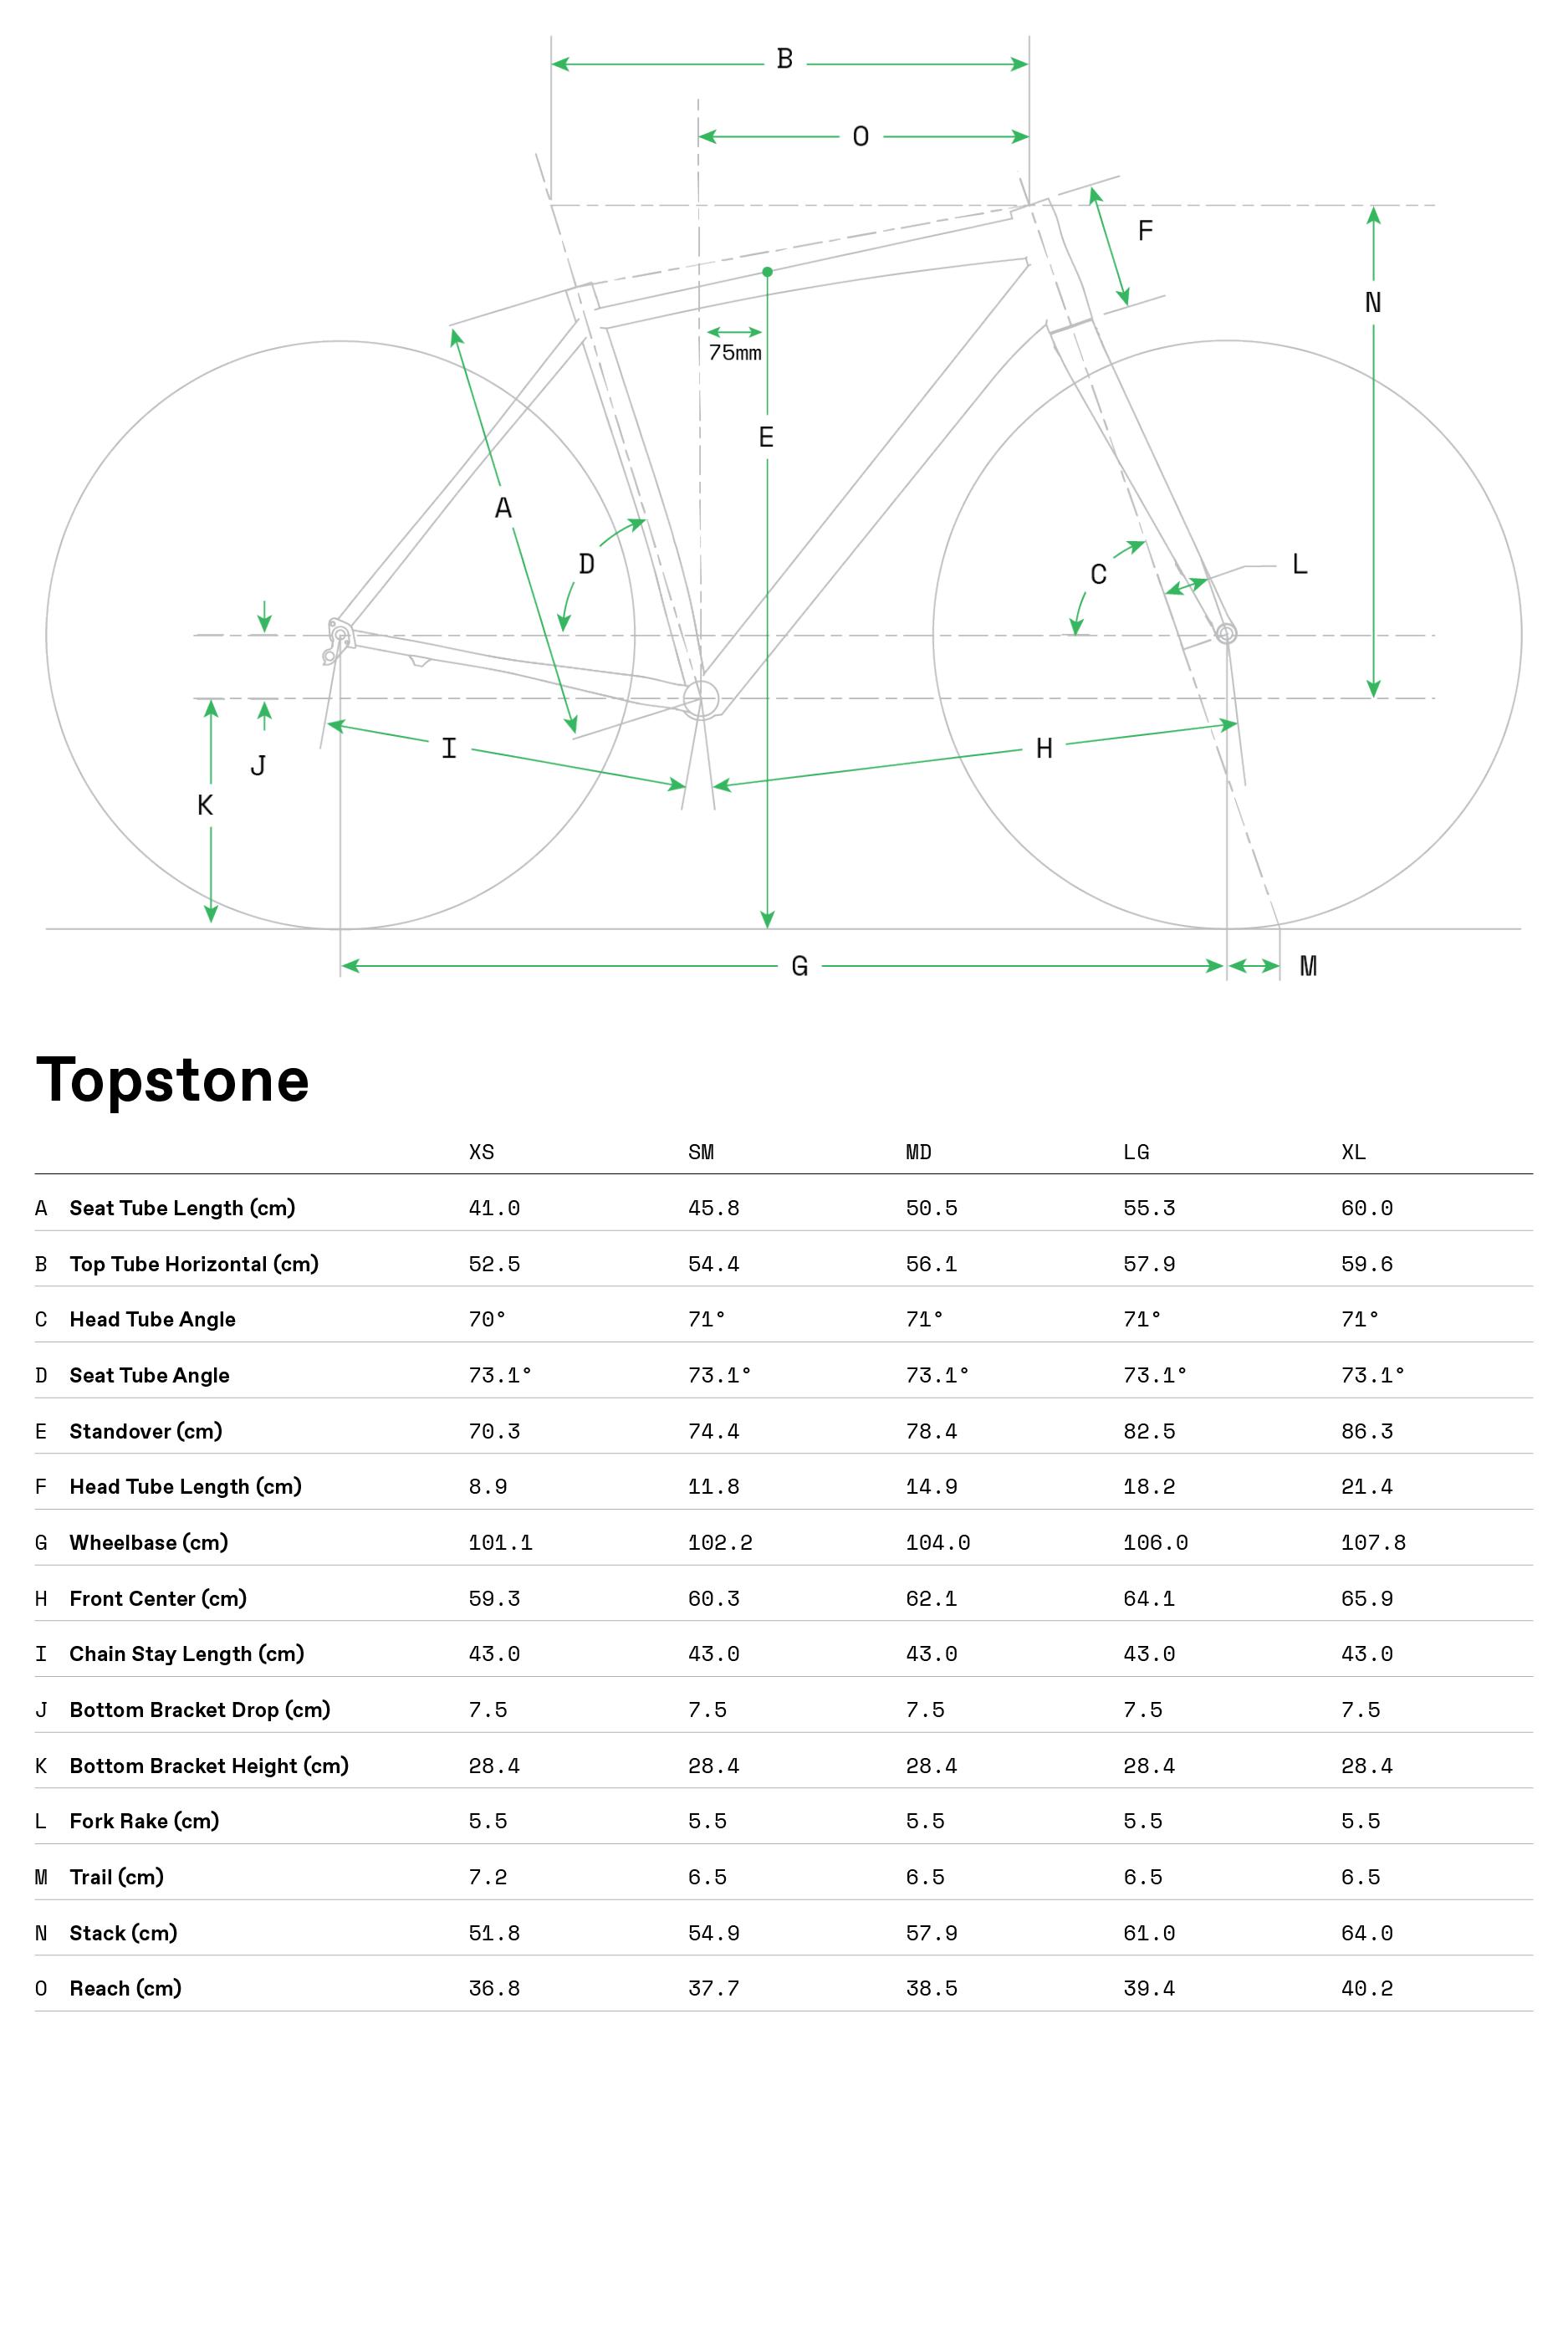 geometria roweru Topstone 3